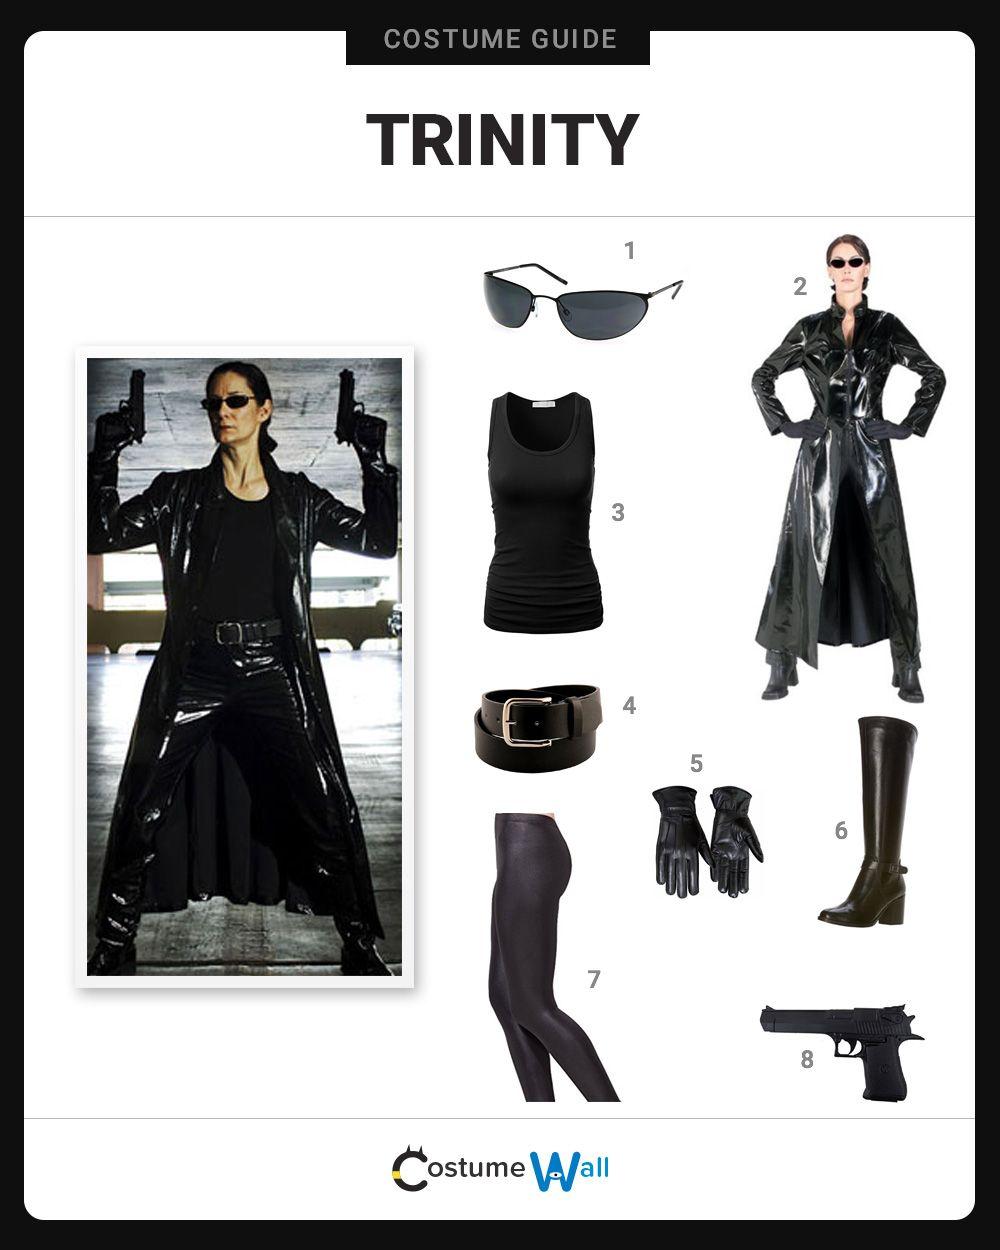 Futuristic coat. Looks like something from The Matrix or